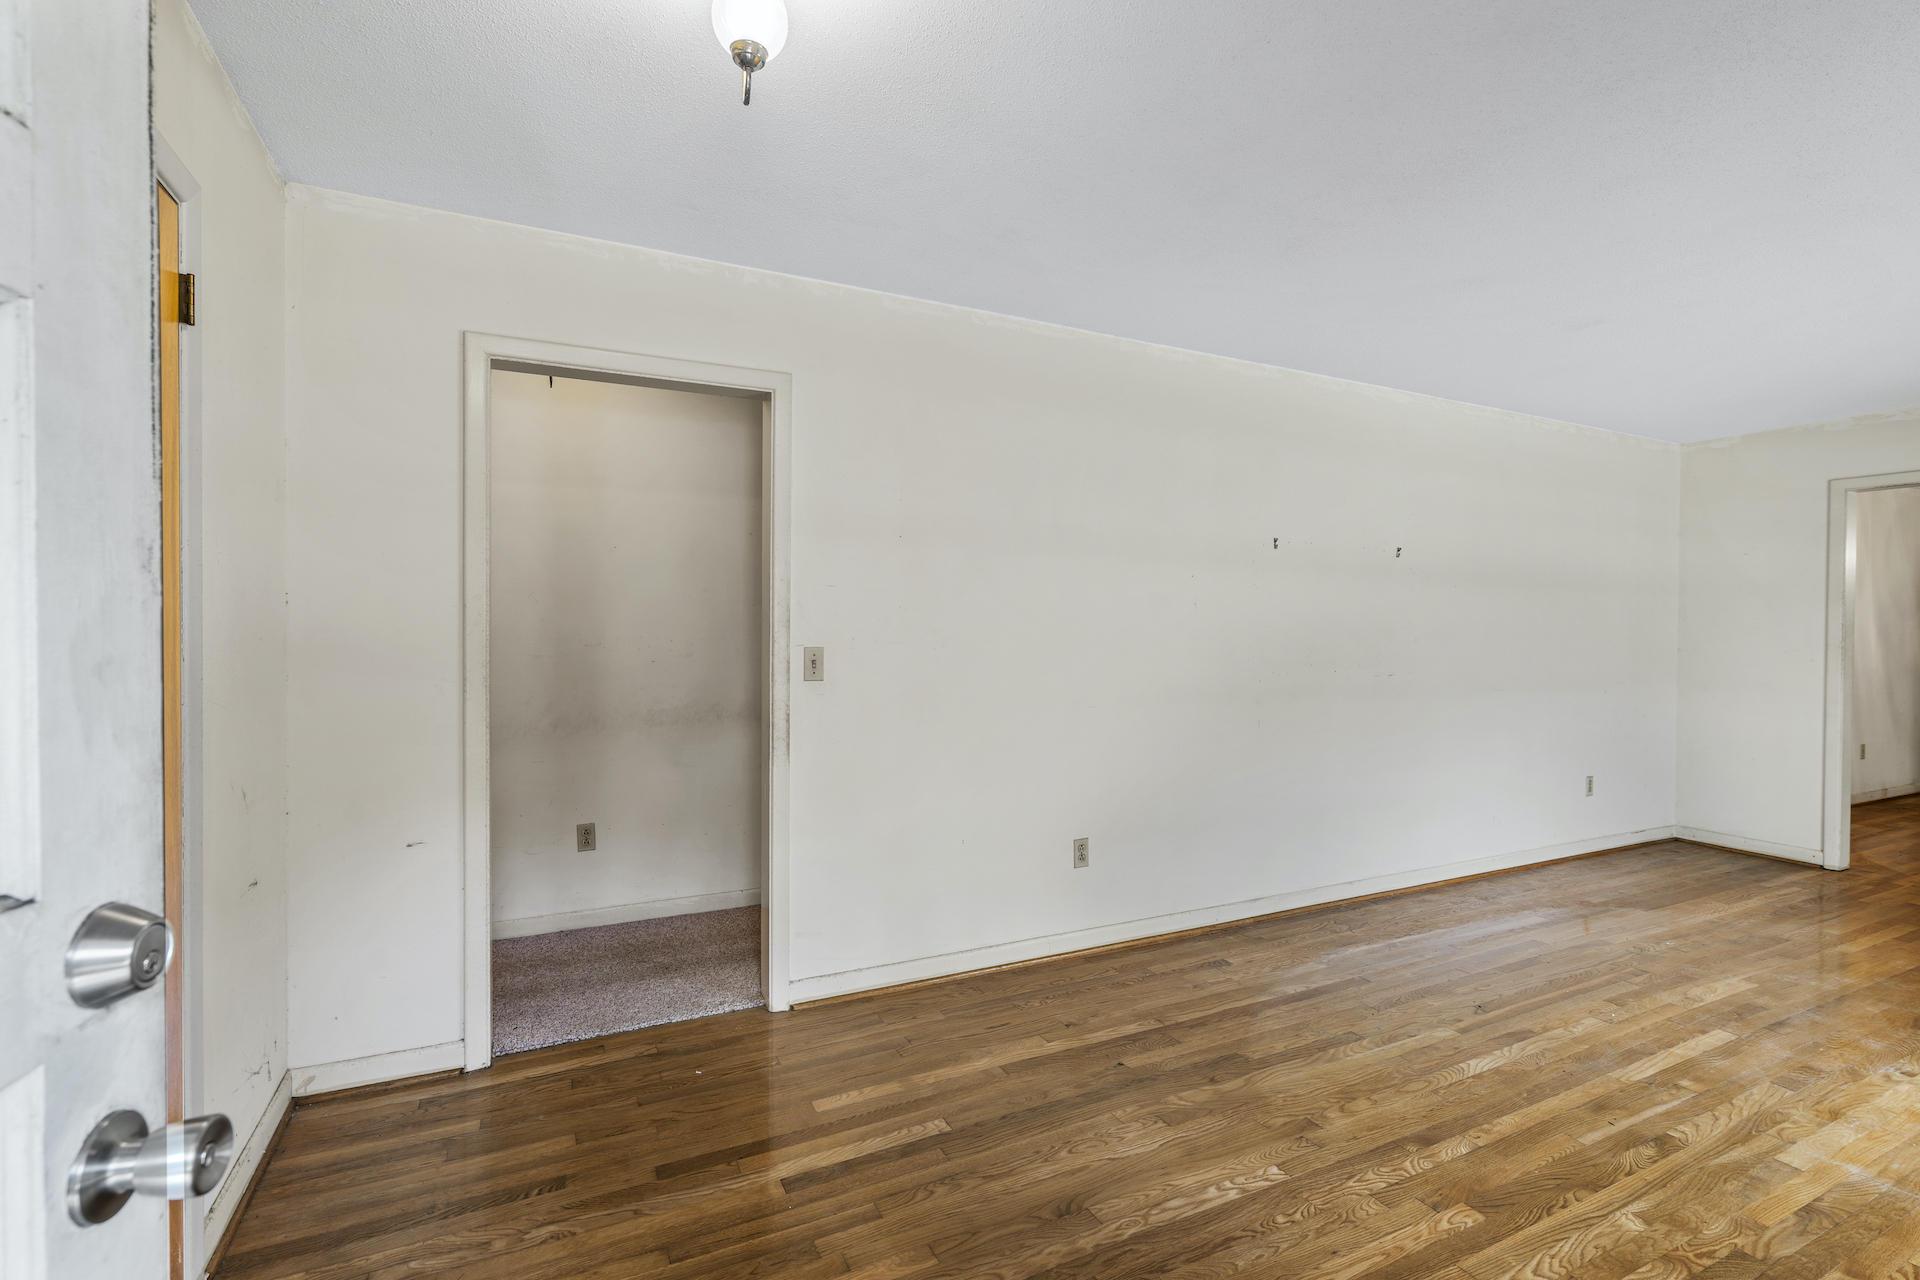 Charlestowne Estates I Homes For Sale - 1137 Culpepper, Charleston, SC - 0